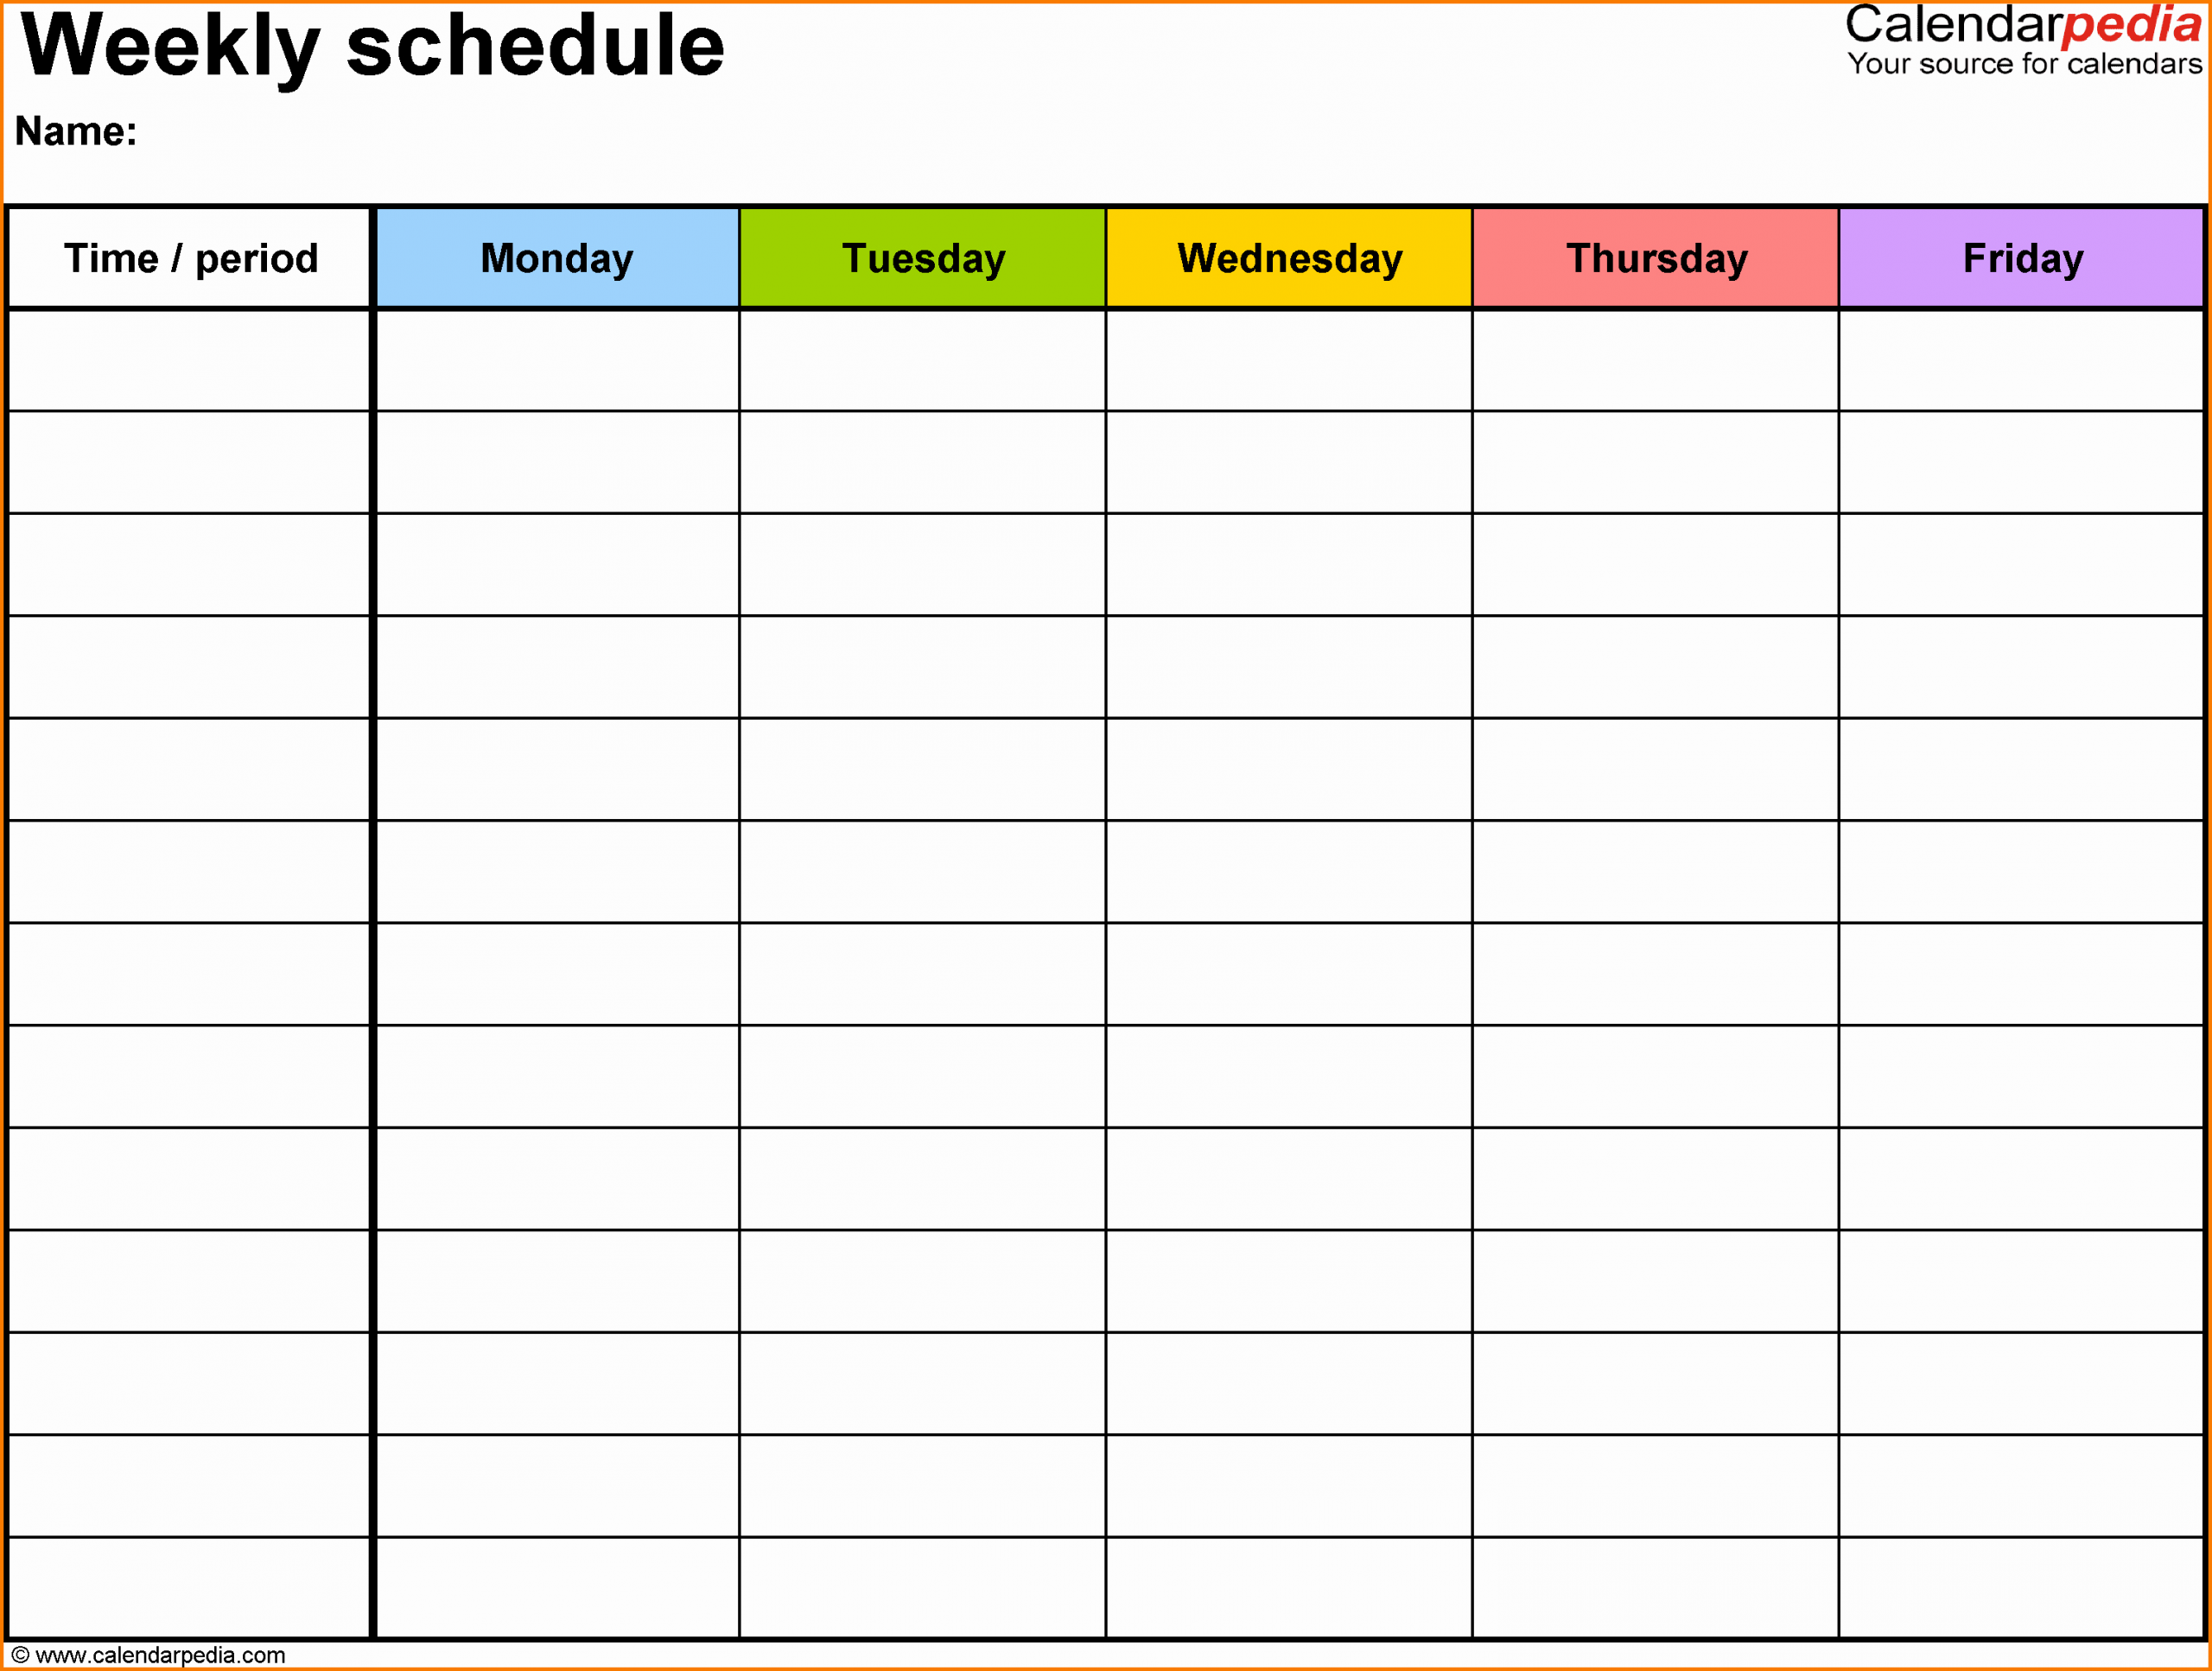 Class Schedule Template Online New Weekly Class Schedule Template Class Schedule Template Schedule Template Schedule Templates [ 1934 x 2560 Pixel ]